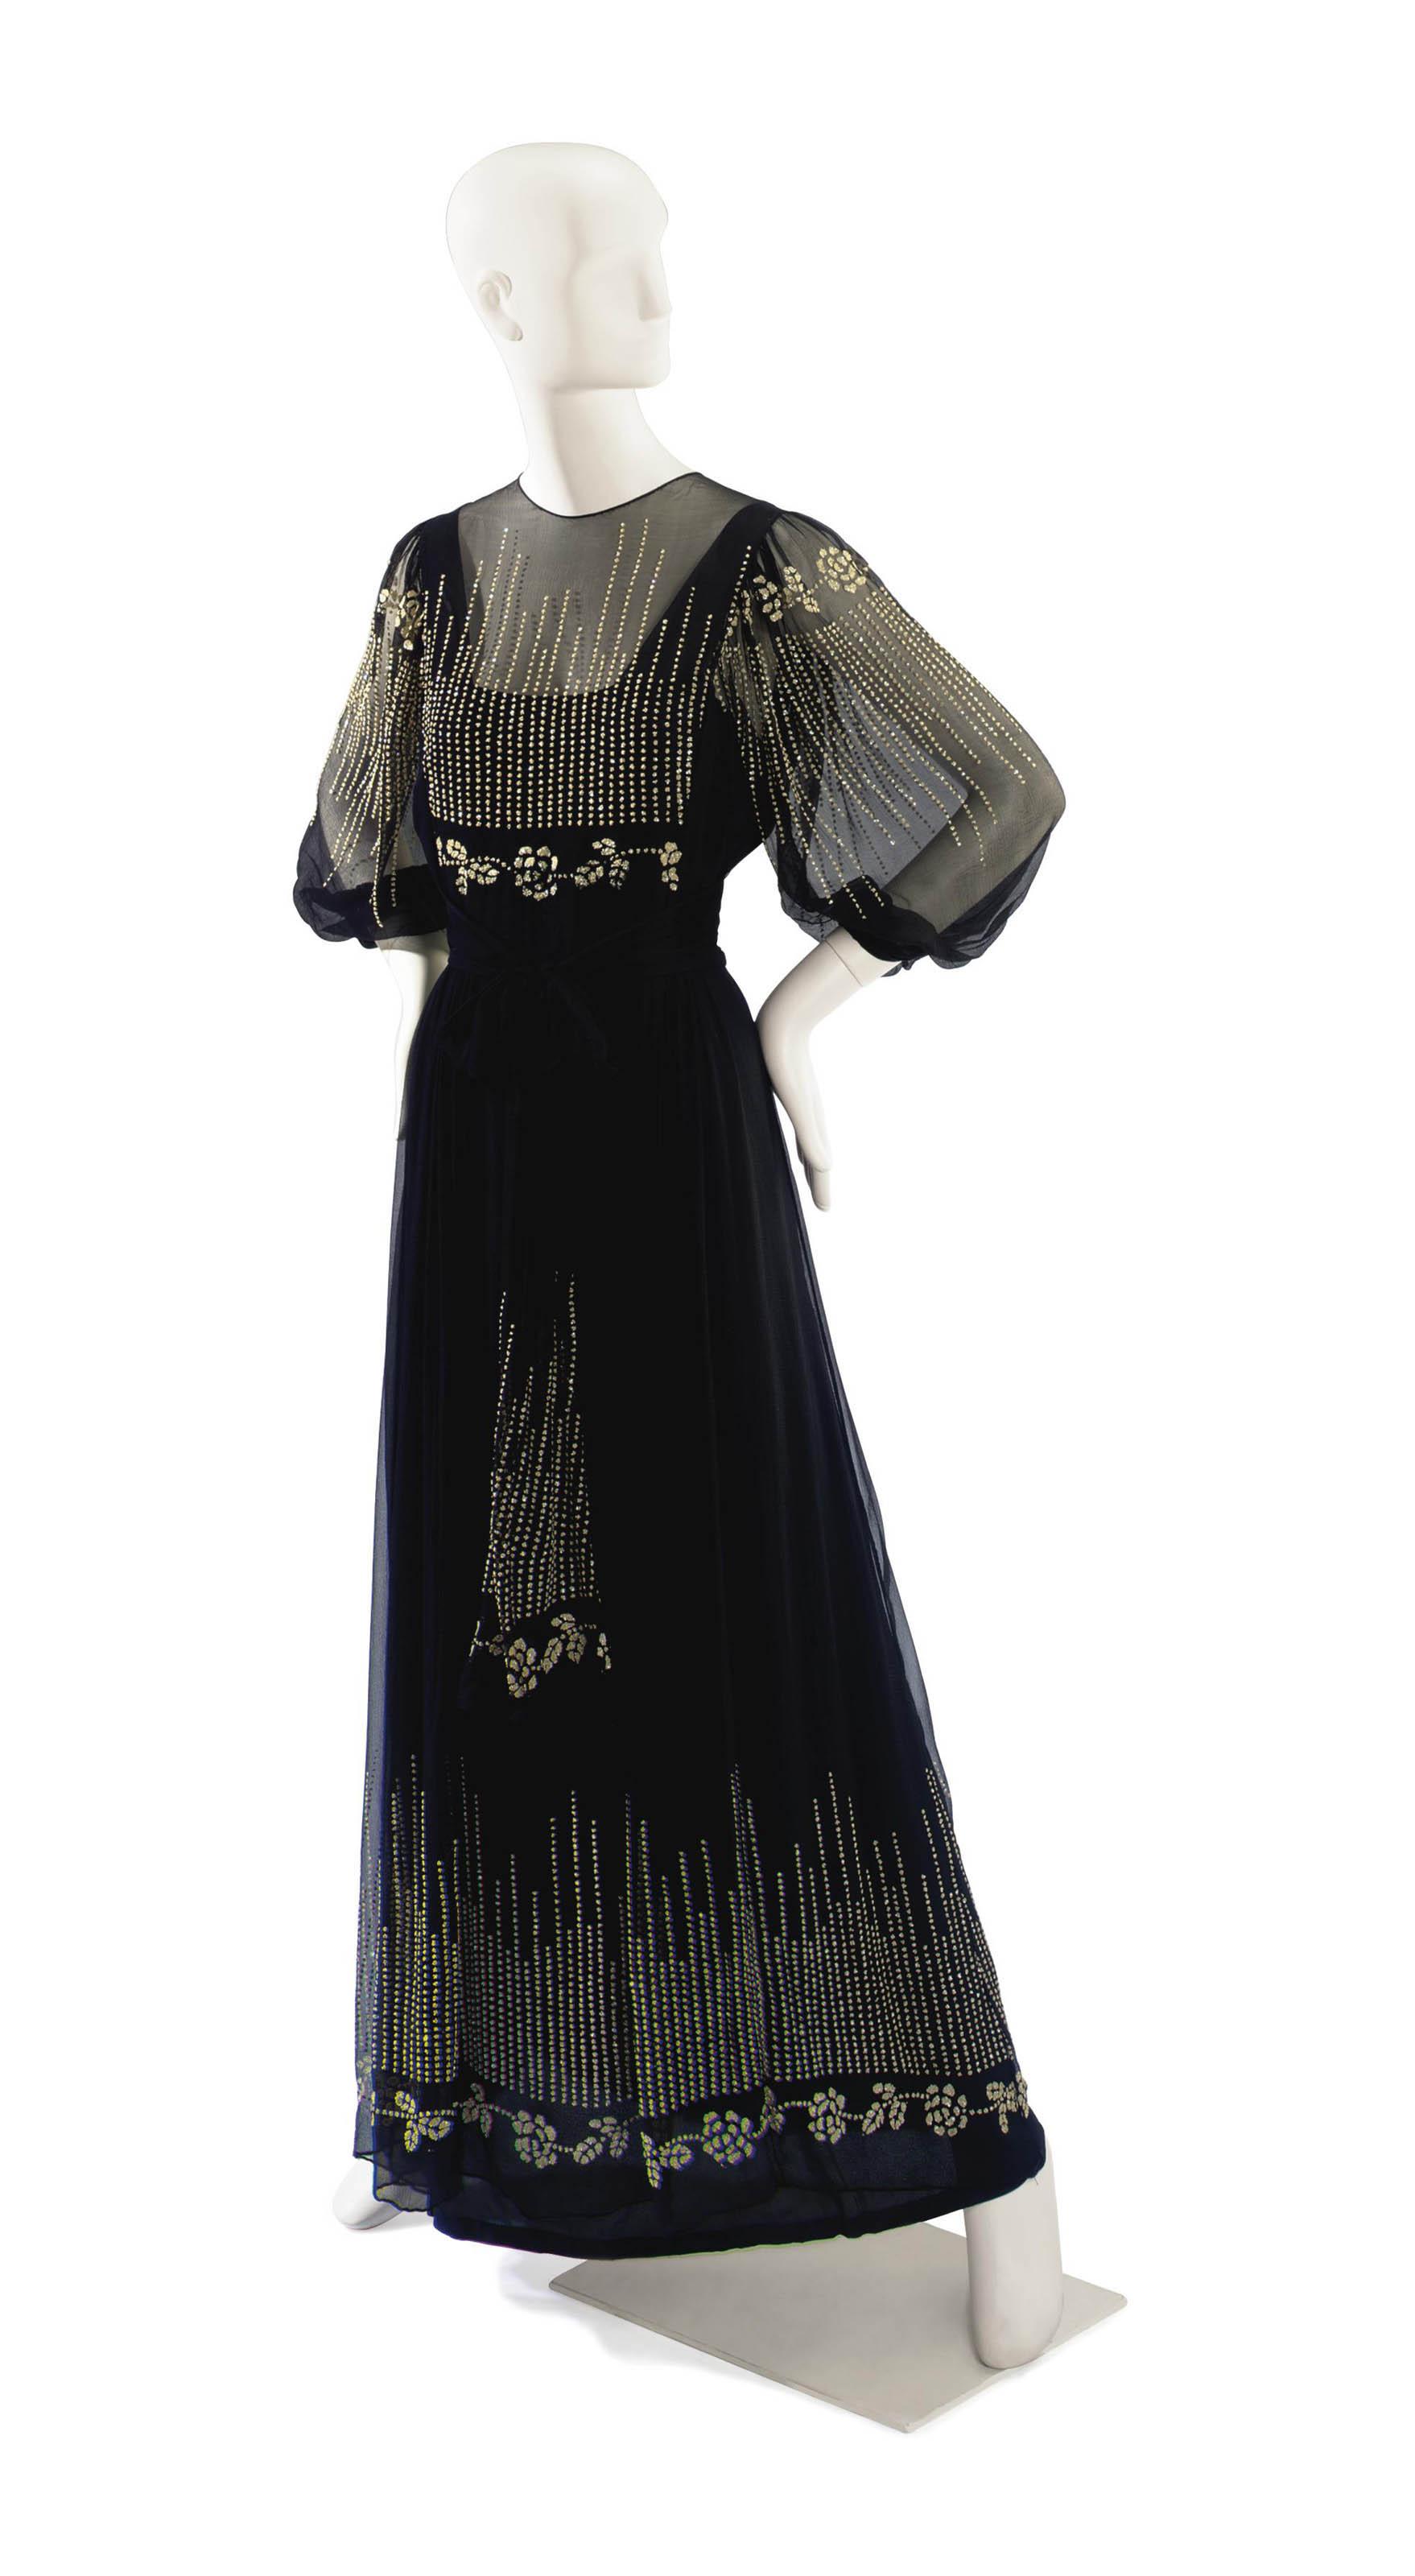 A THEA PORTER BLACK CHIFFON EVENING DRESS